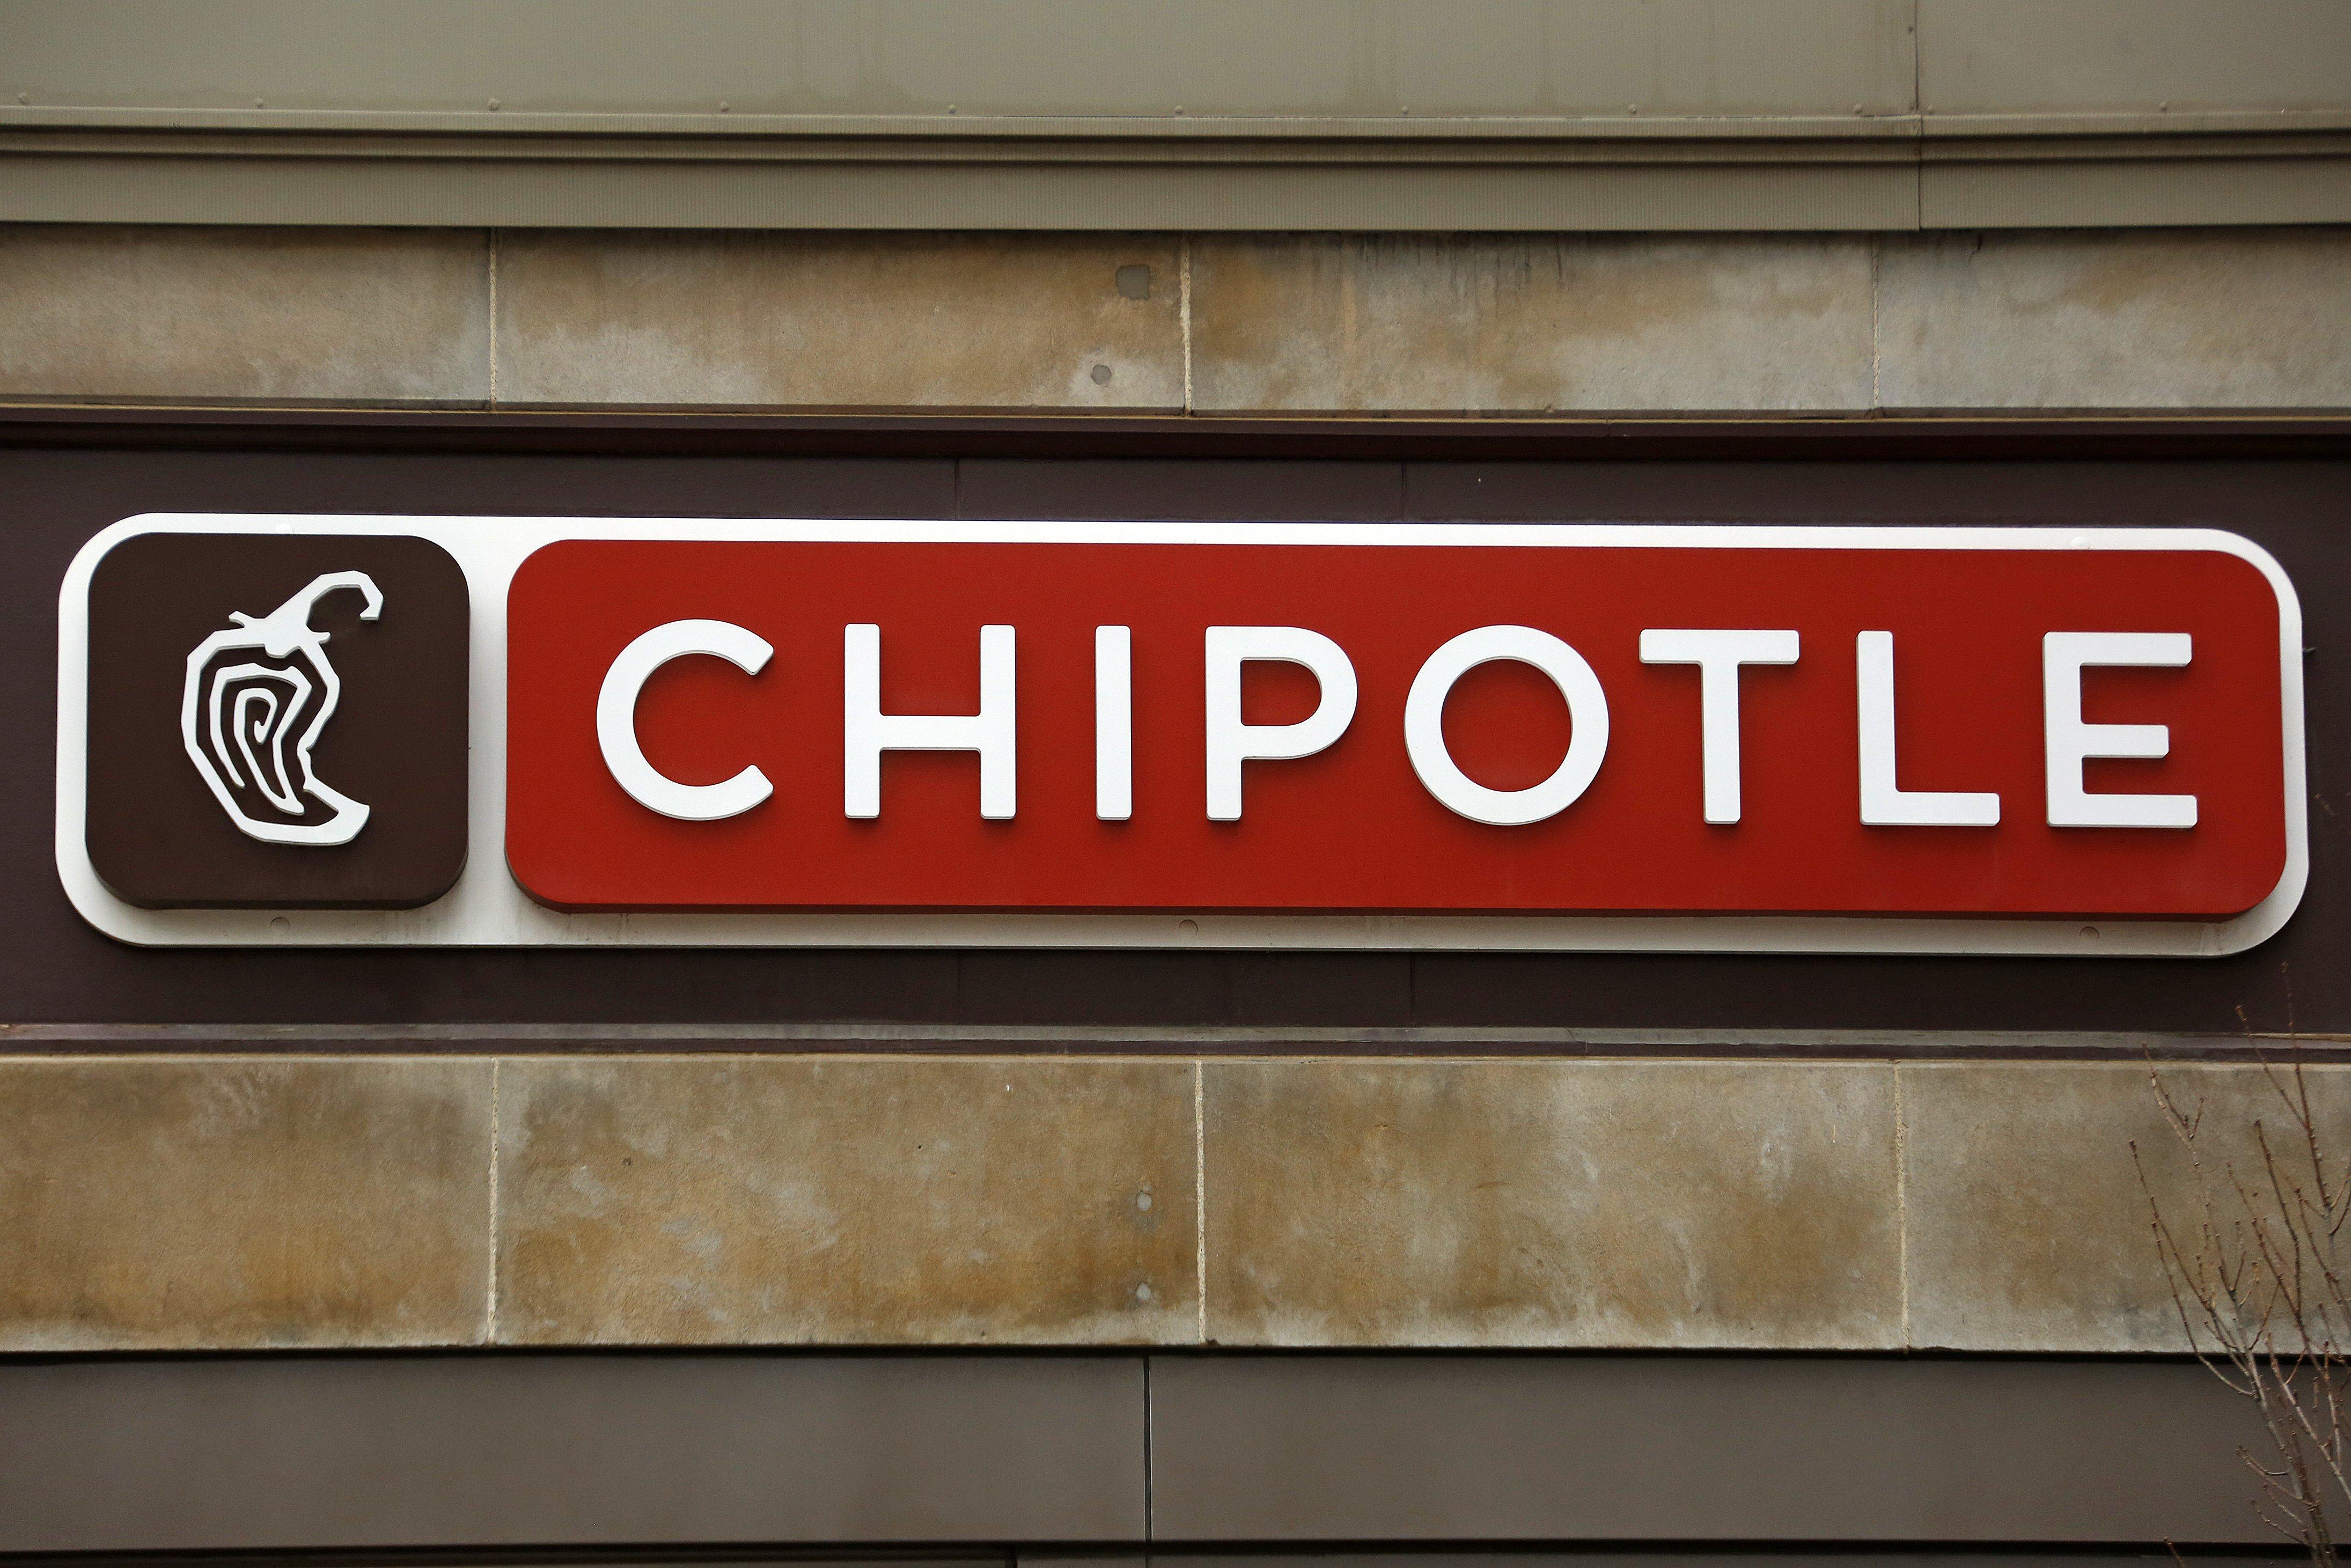 Image: Chipotle restaurant sign